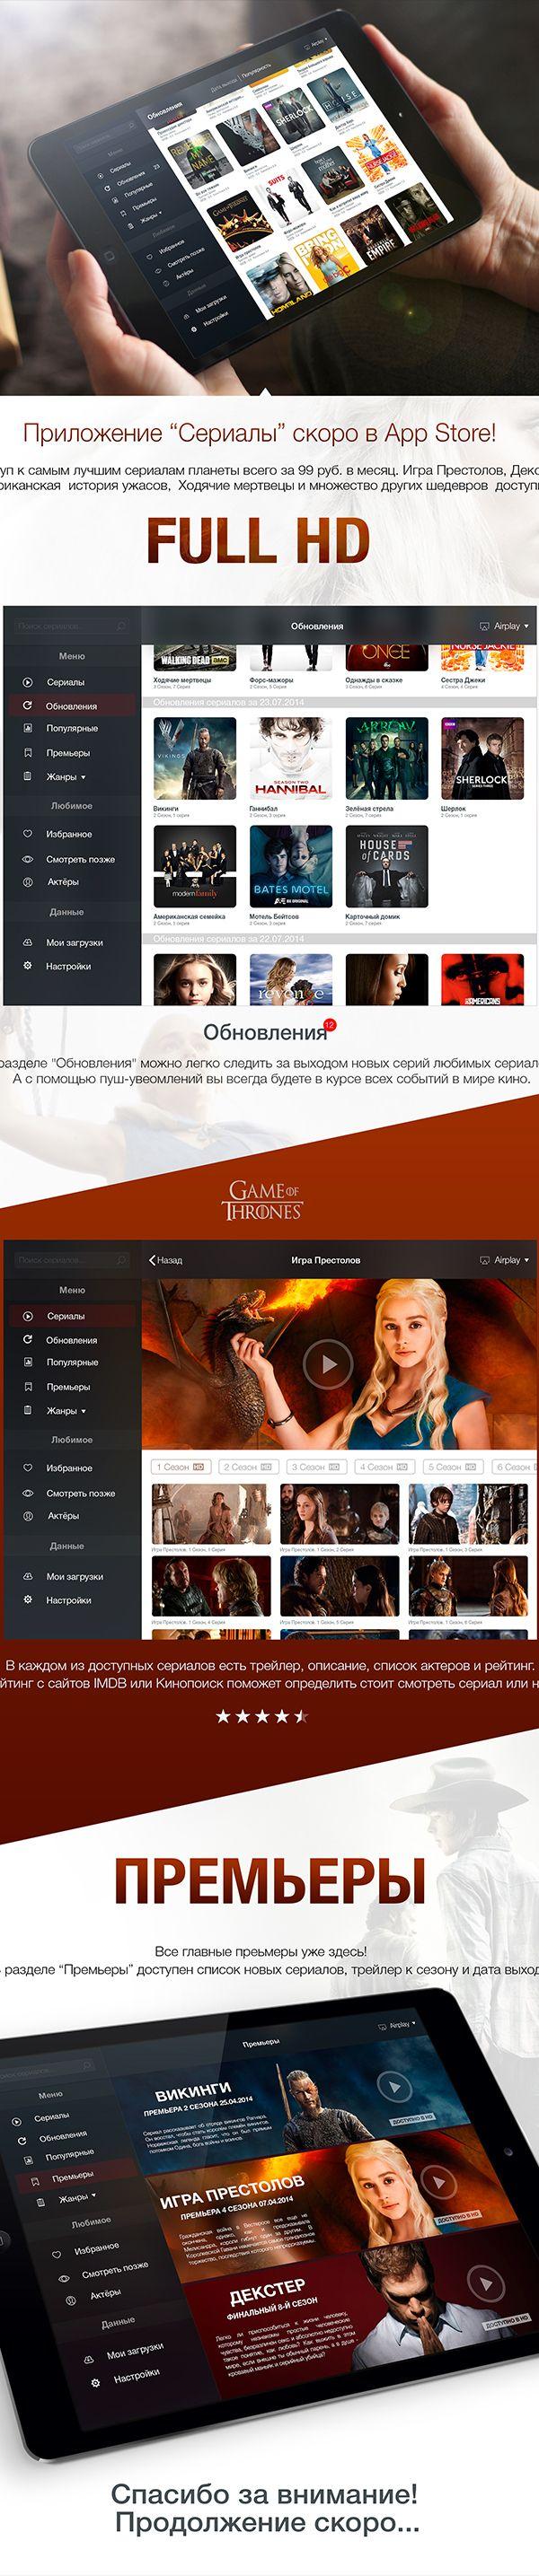 "App for iPad ""Serials"" / Приложение для iPad ""Сериалы""  by Nik Katsevich, via Behance"